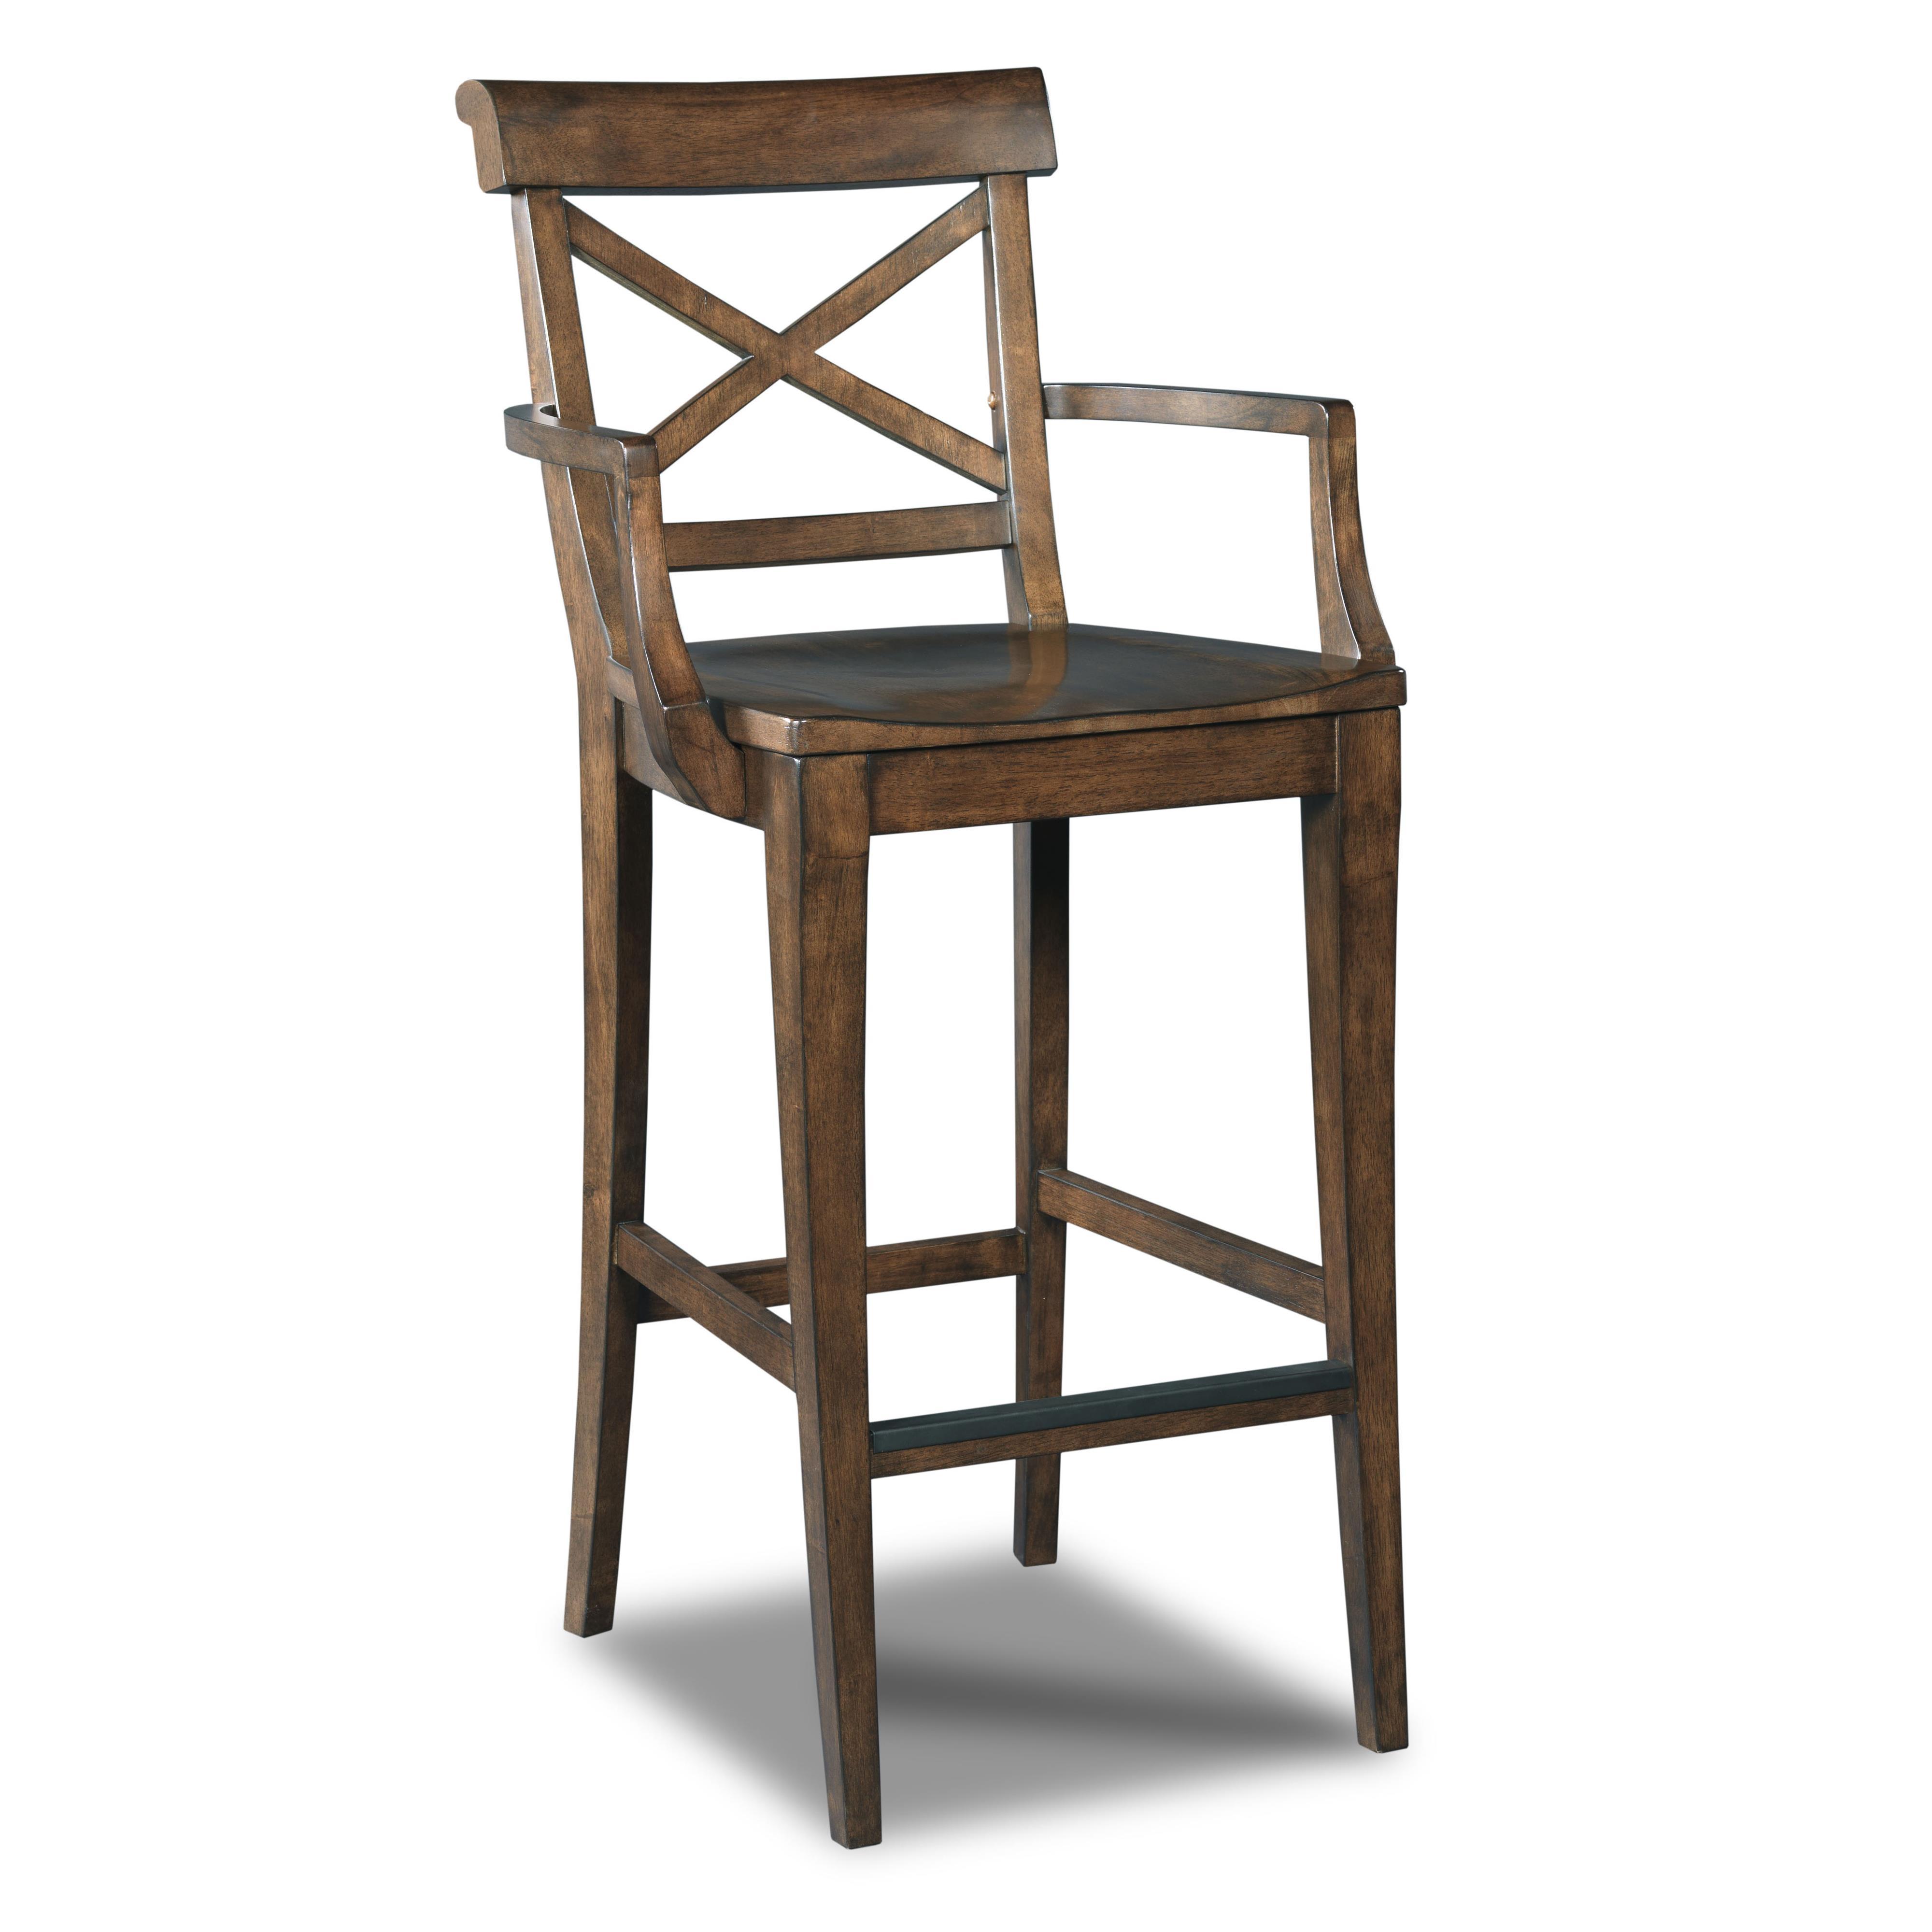 Hooker Furniture Stools Medium Rob Roy X-Back Barstool - Item Number: 300-20008